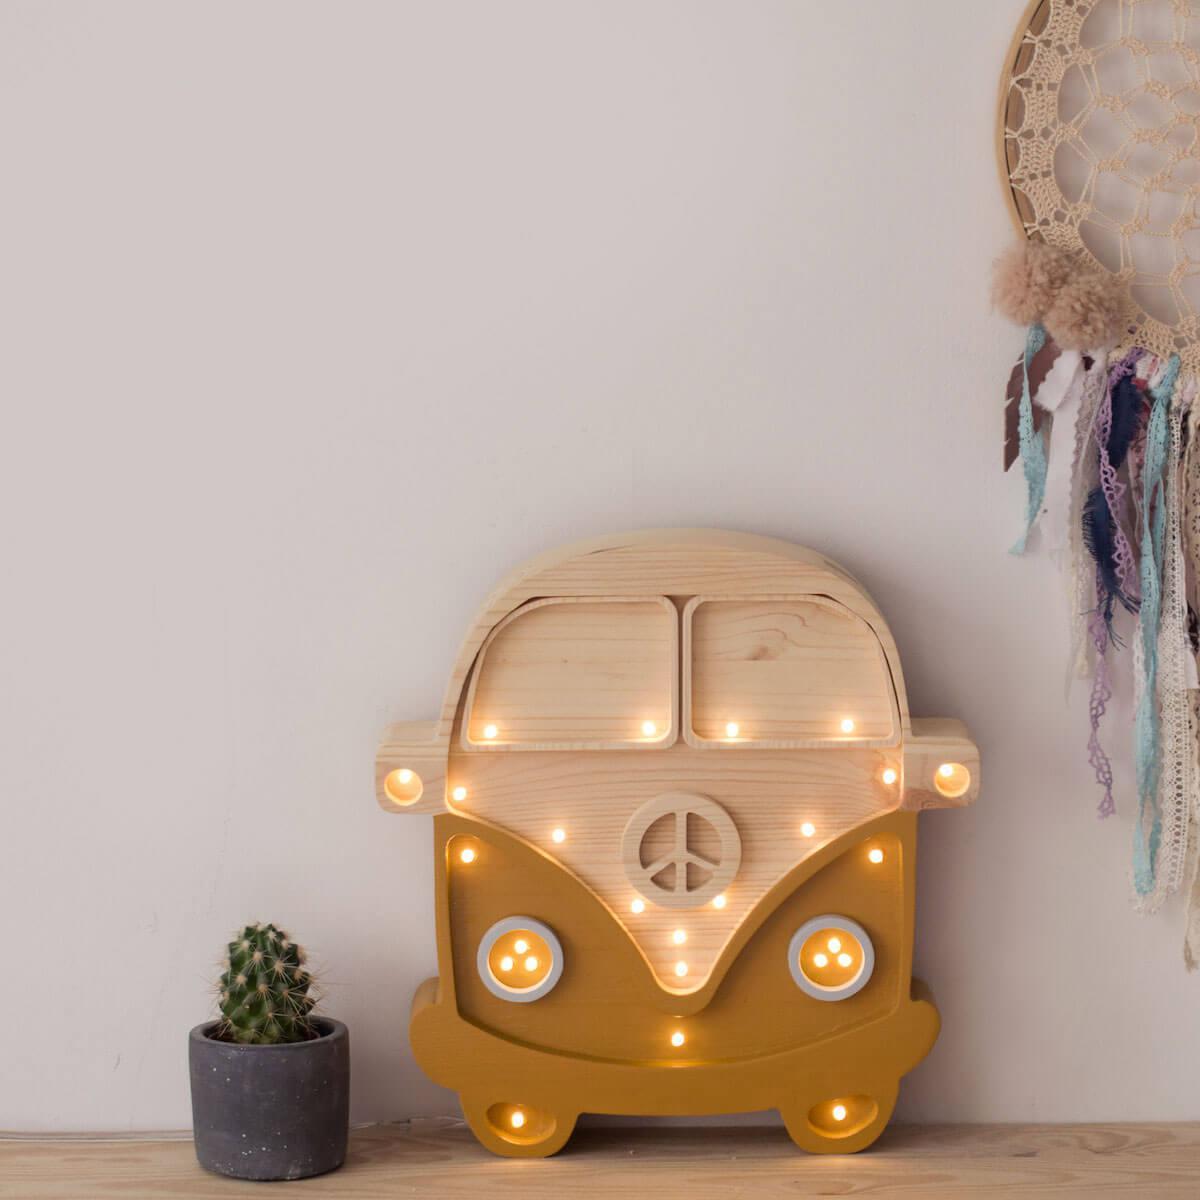 Lampe lumières VAN Little Lights mustard-wood